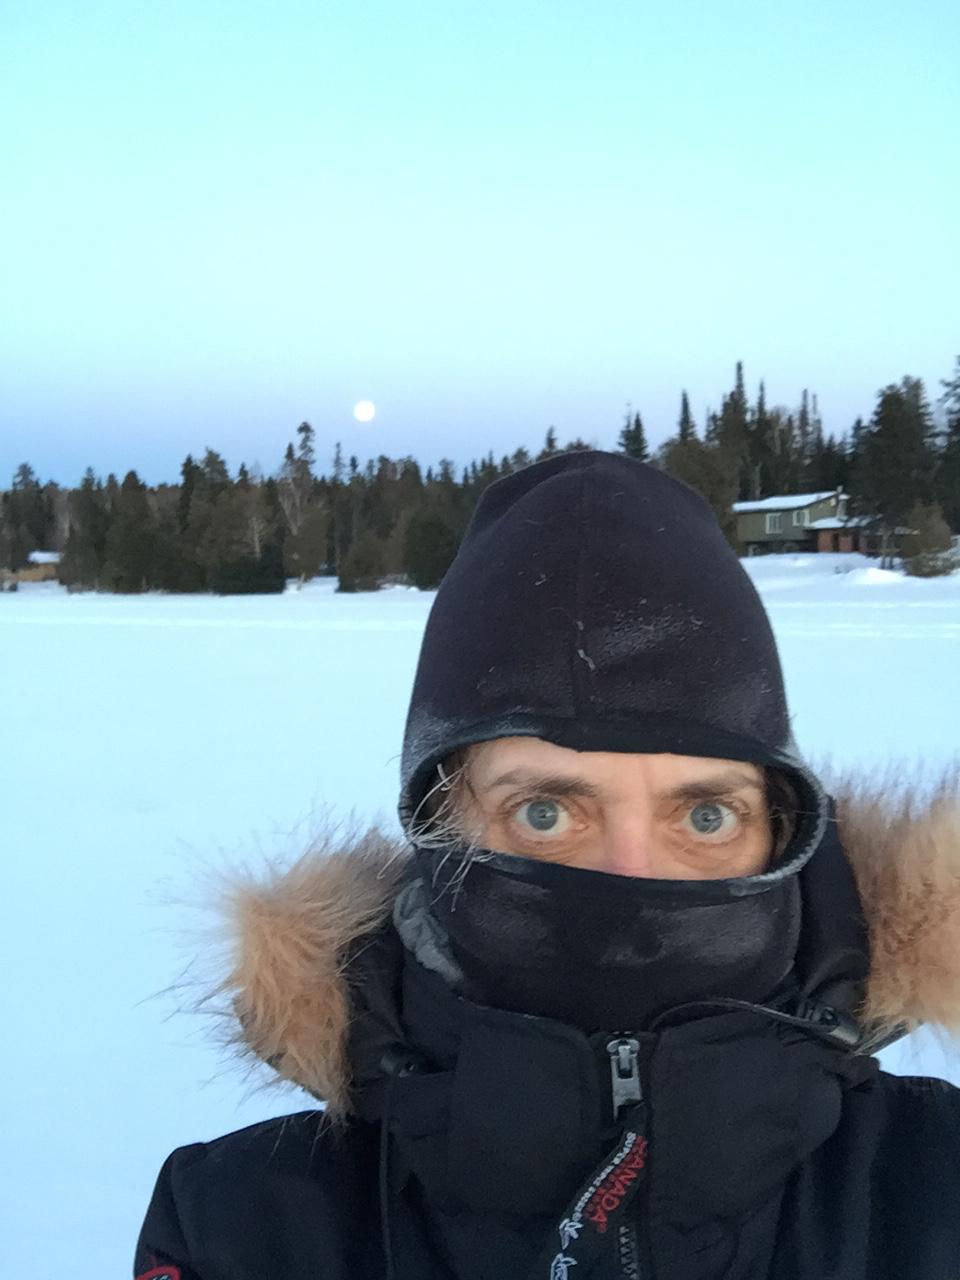 full moon rising over frozen lake — with Amanta Scott